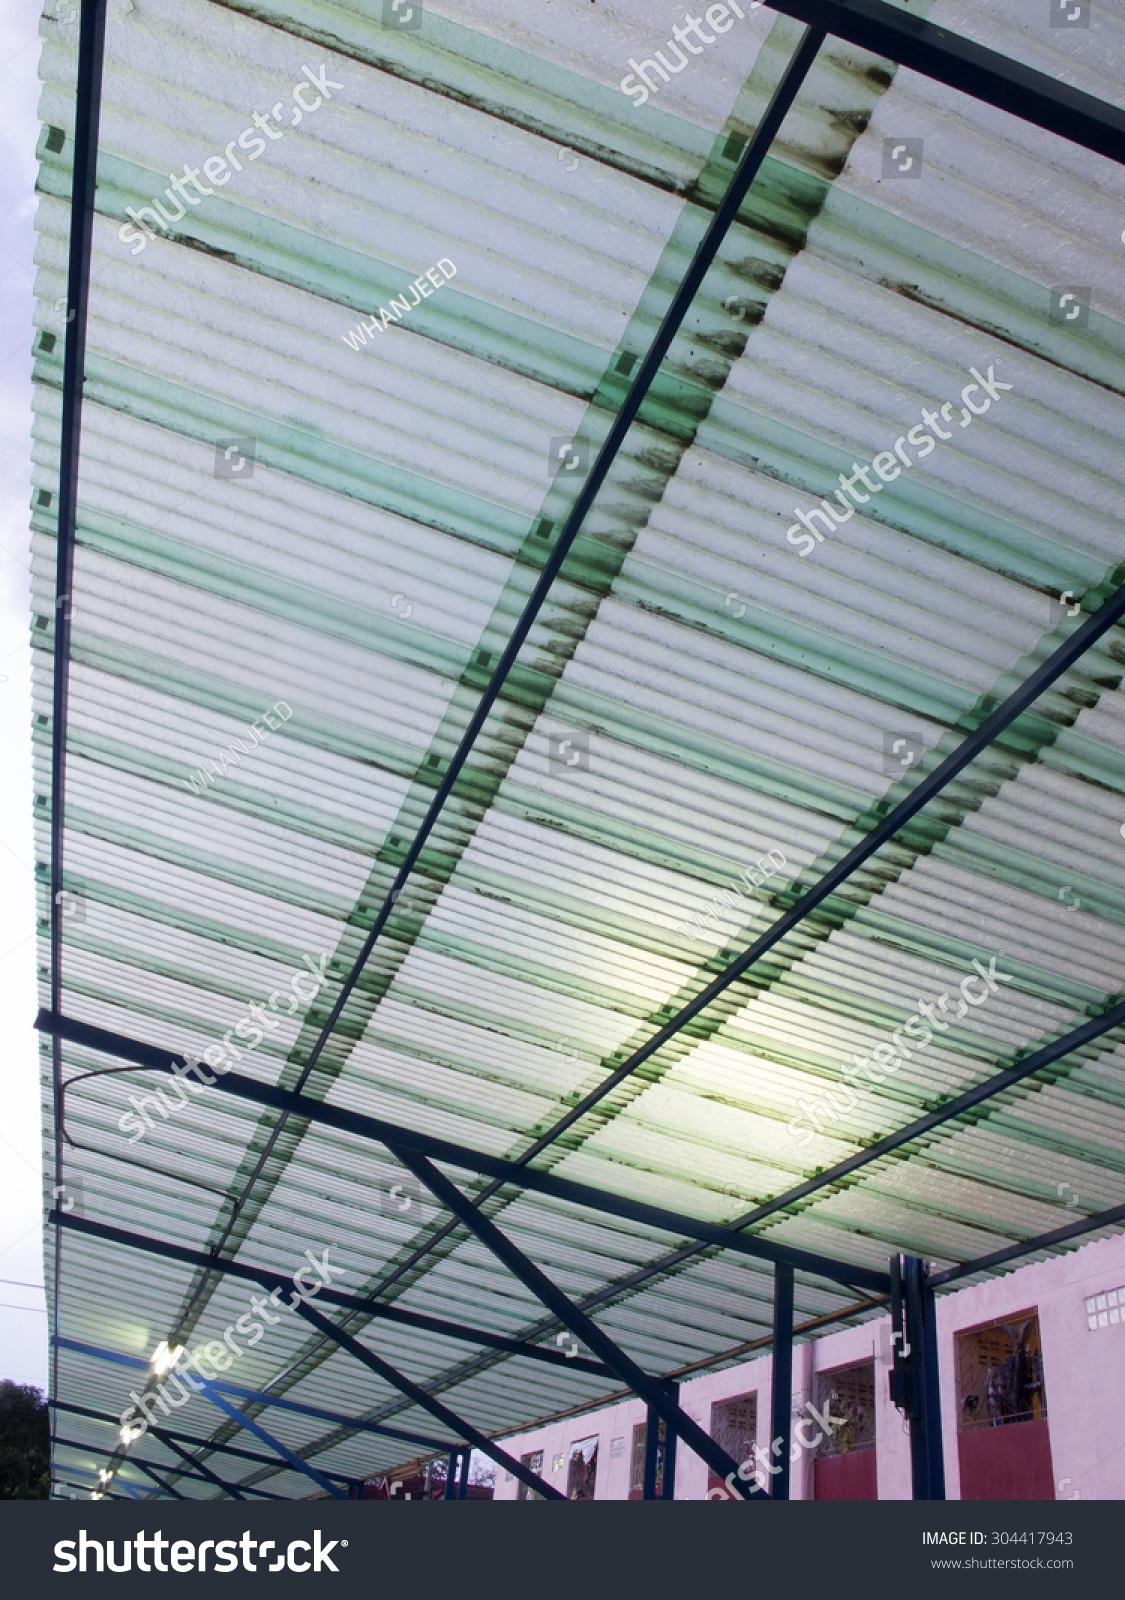 Transparent Roof Tiles Car Parking Stock Photo Edit Now 304417943